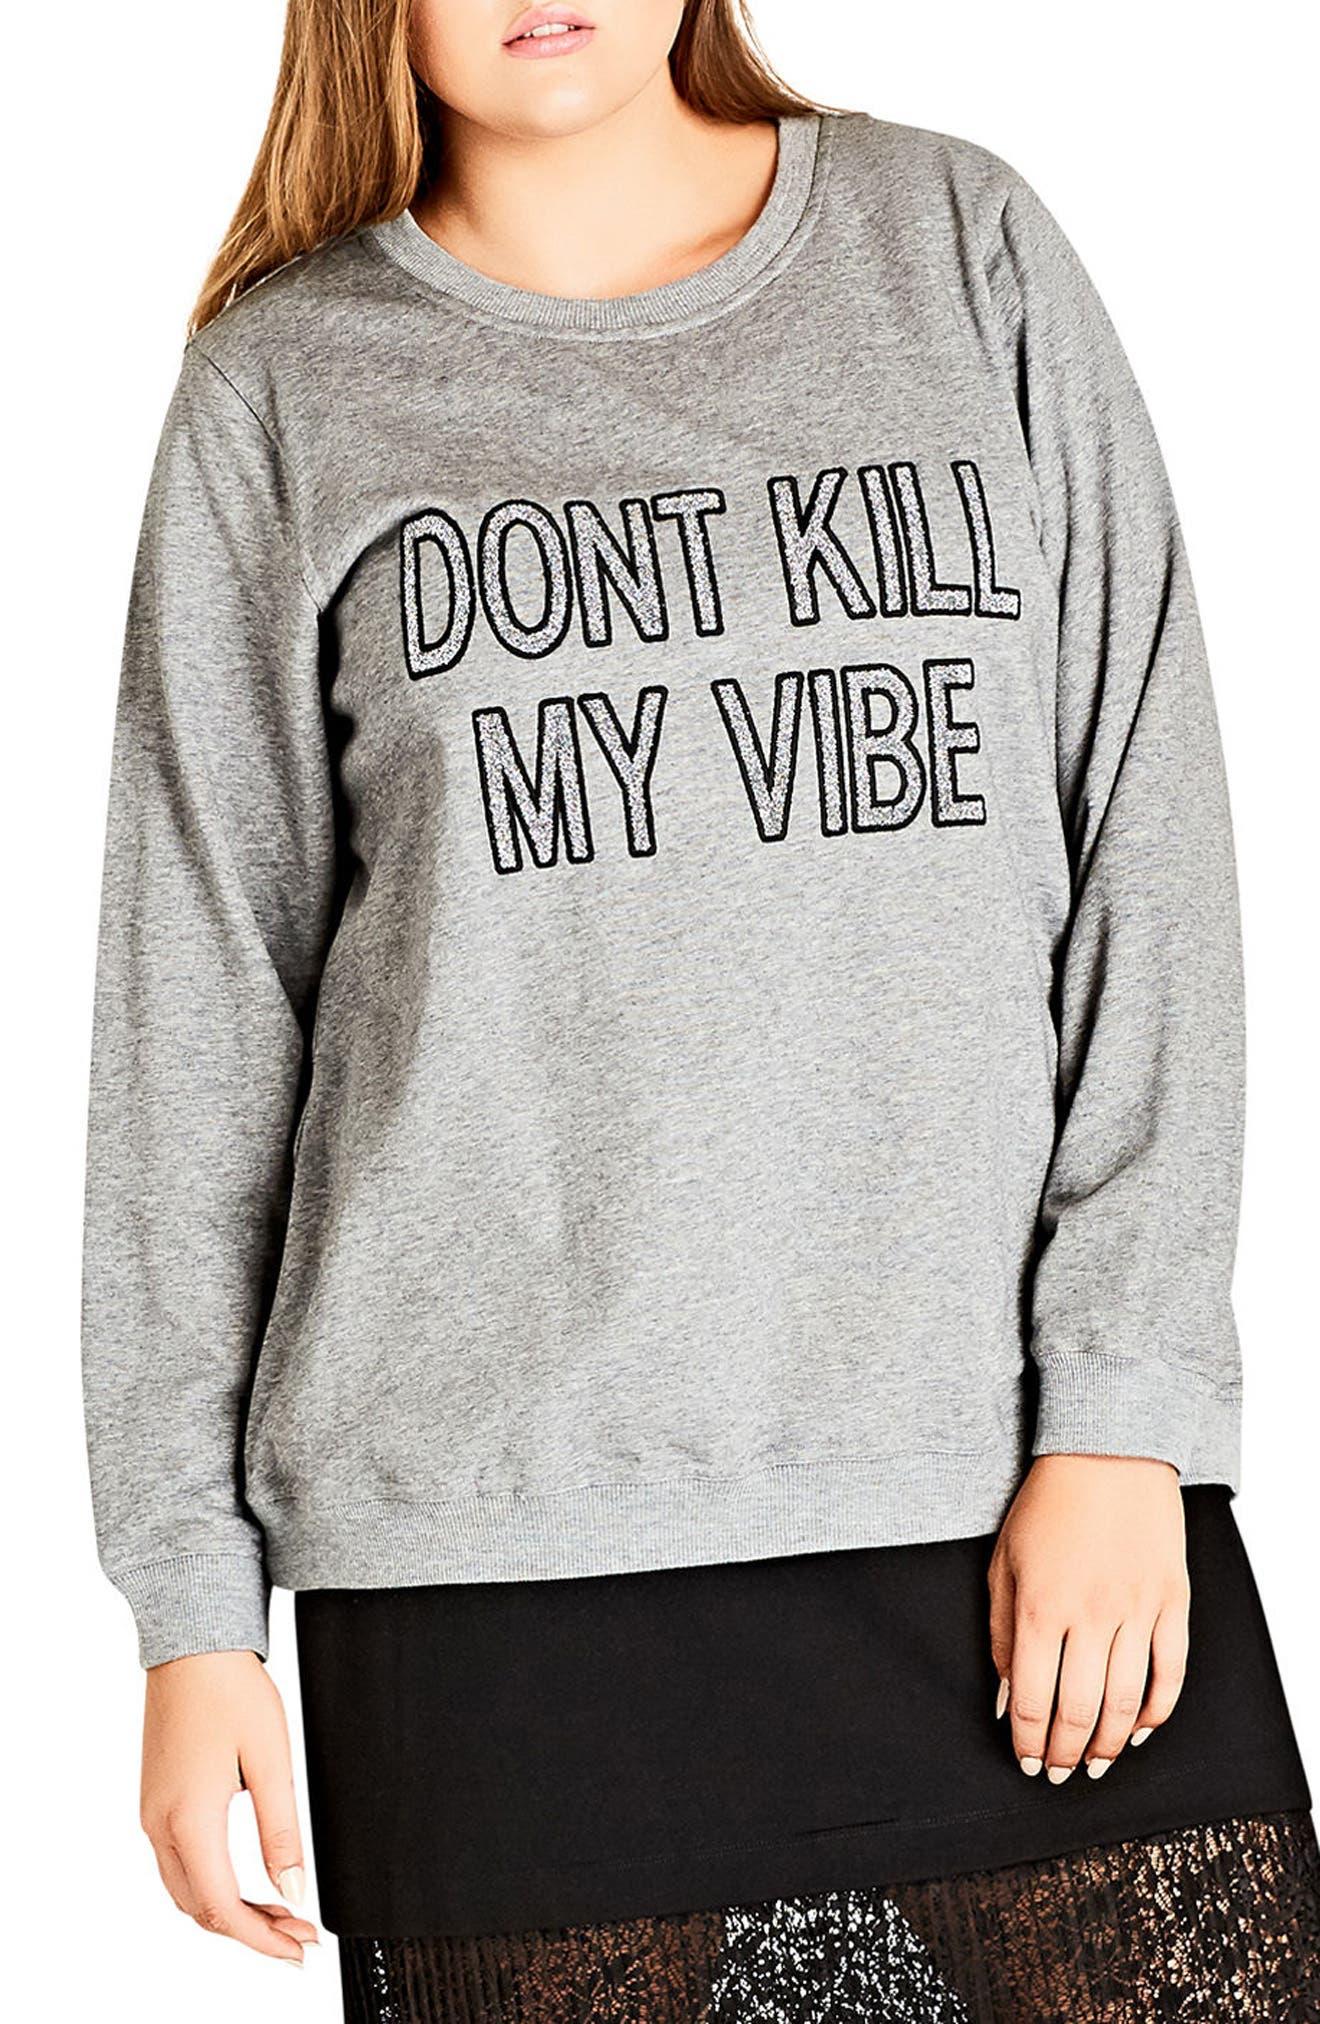 Vibes Glitter Graphic Sweatshirt,                             Main thumbnail 1, color,                             Grey Marle